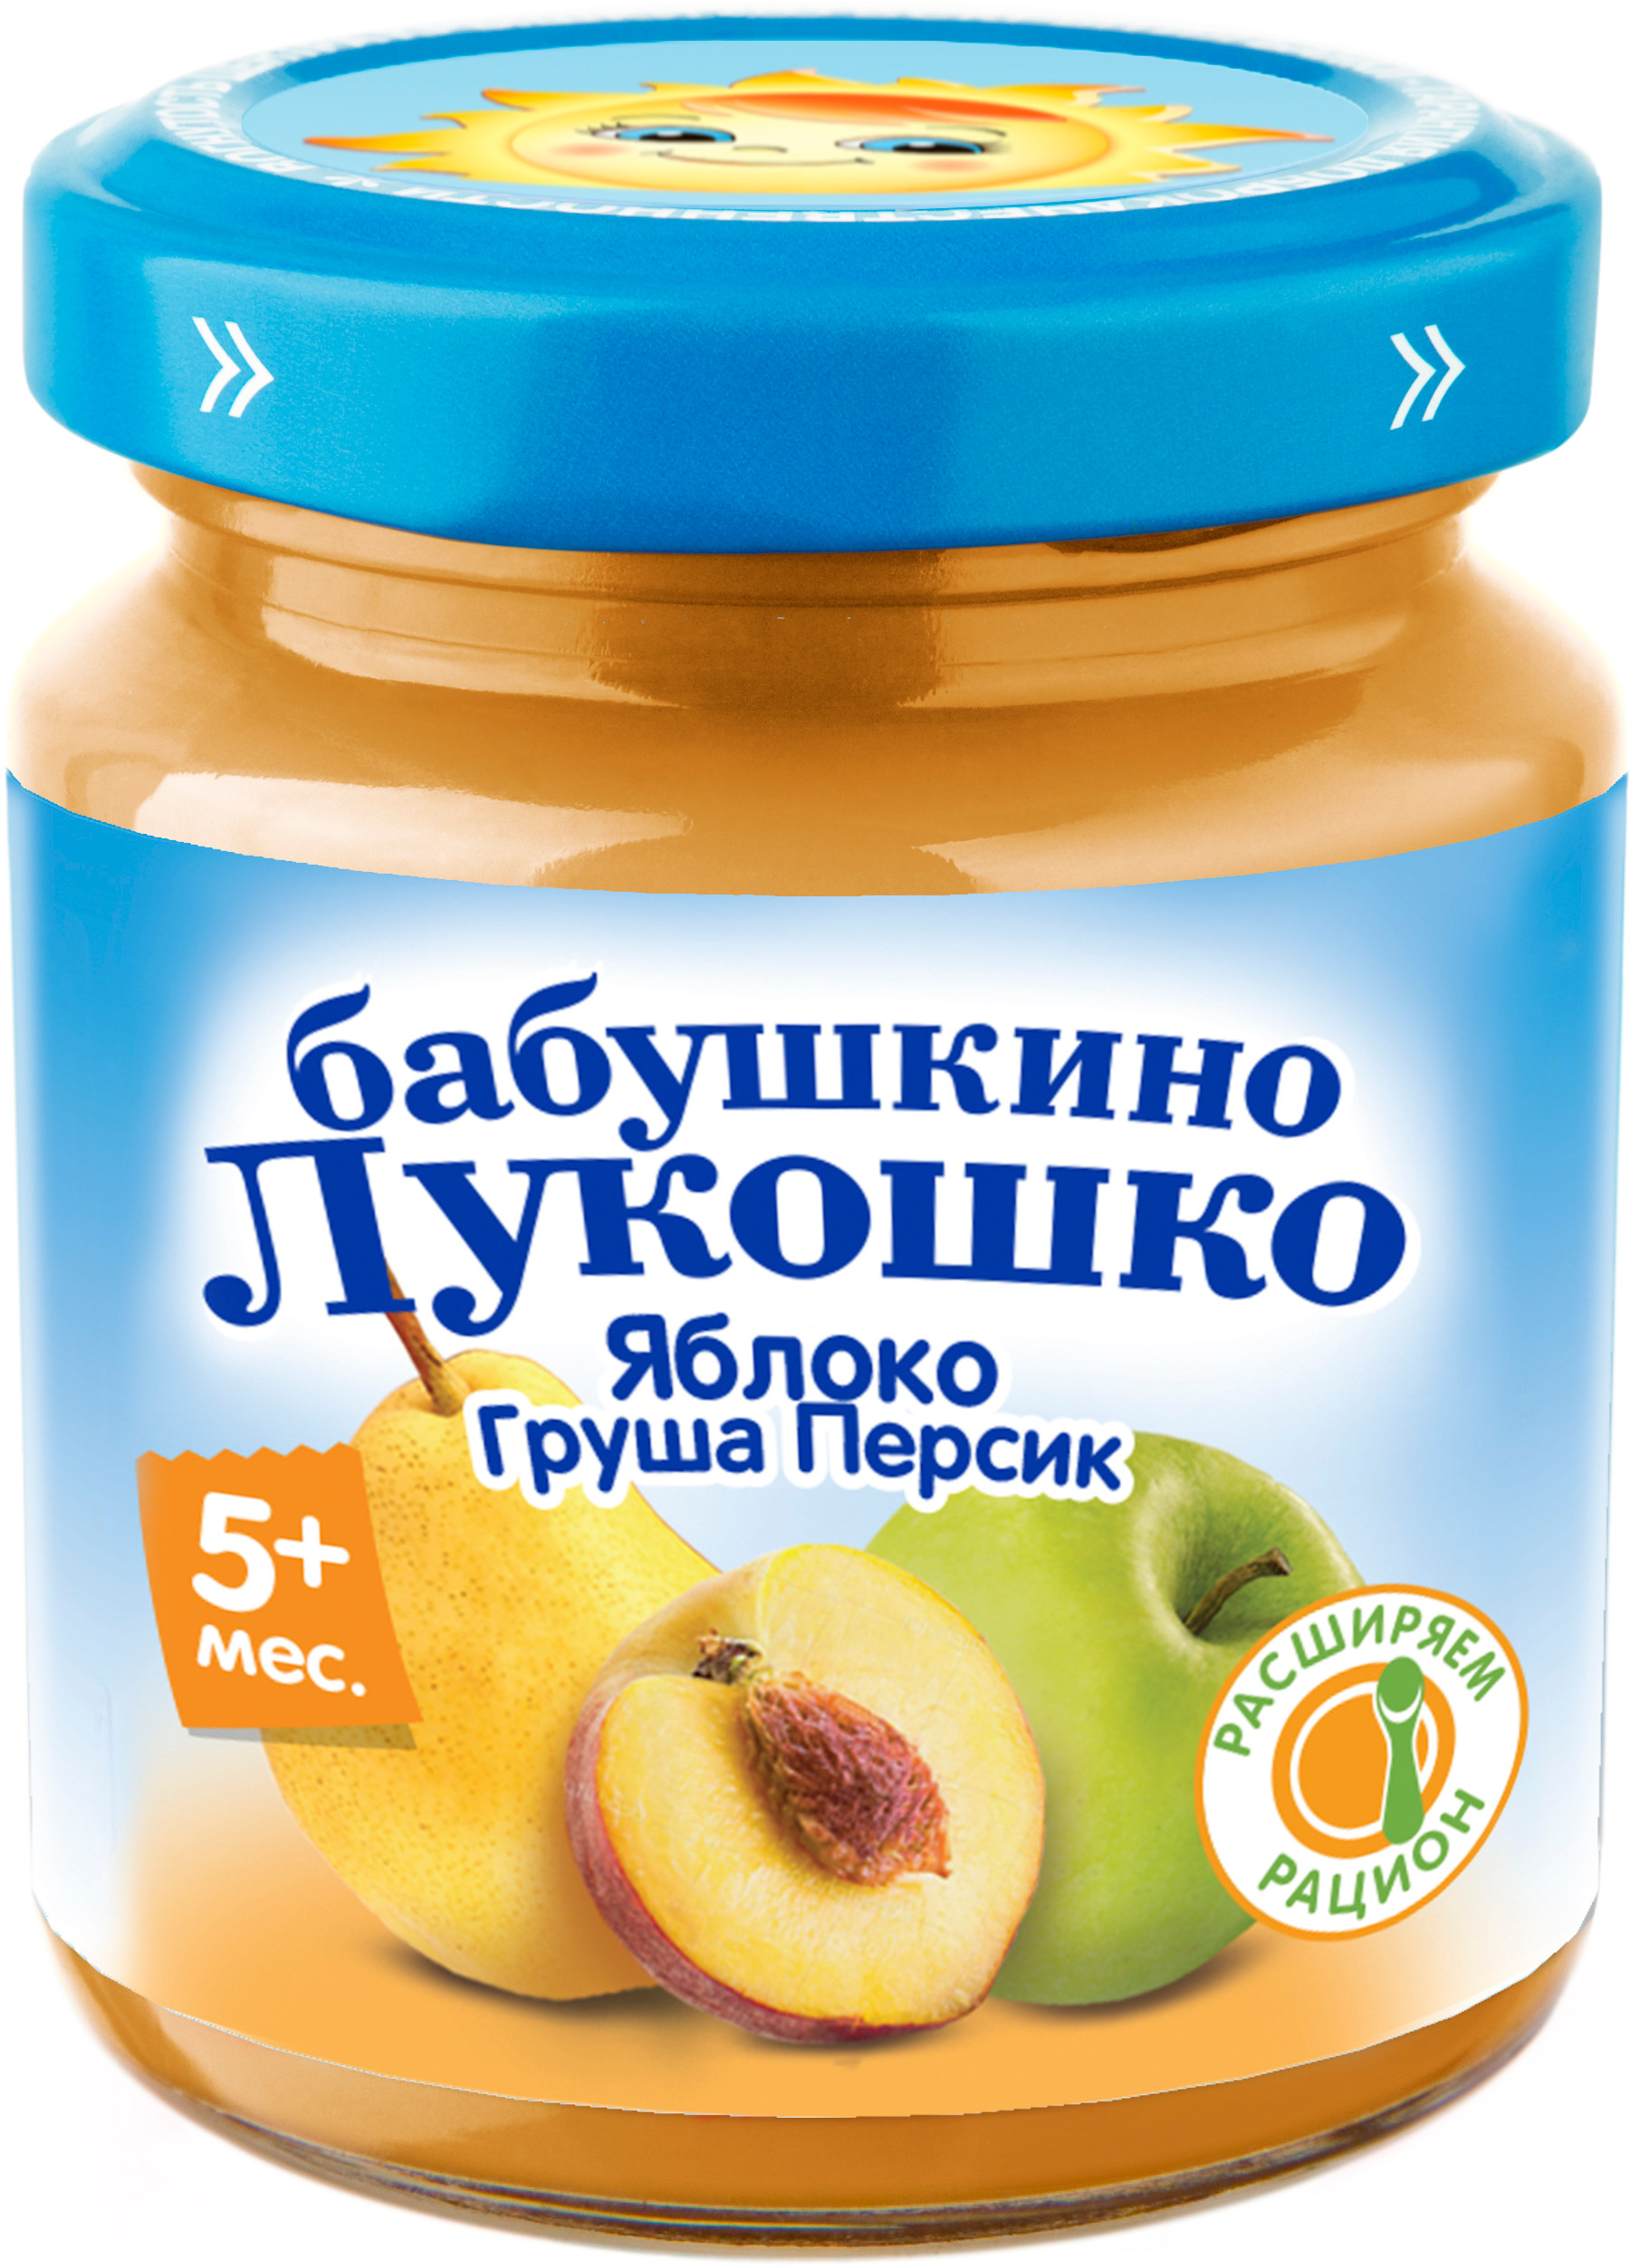 Фото - Пюре Бабушкино лукошко Бабушкино лукошко Яблоко, груша, персик с 5 мес. 100 г пюре heinz organic яблоко и груша с 5 мес 80 г